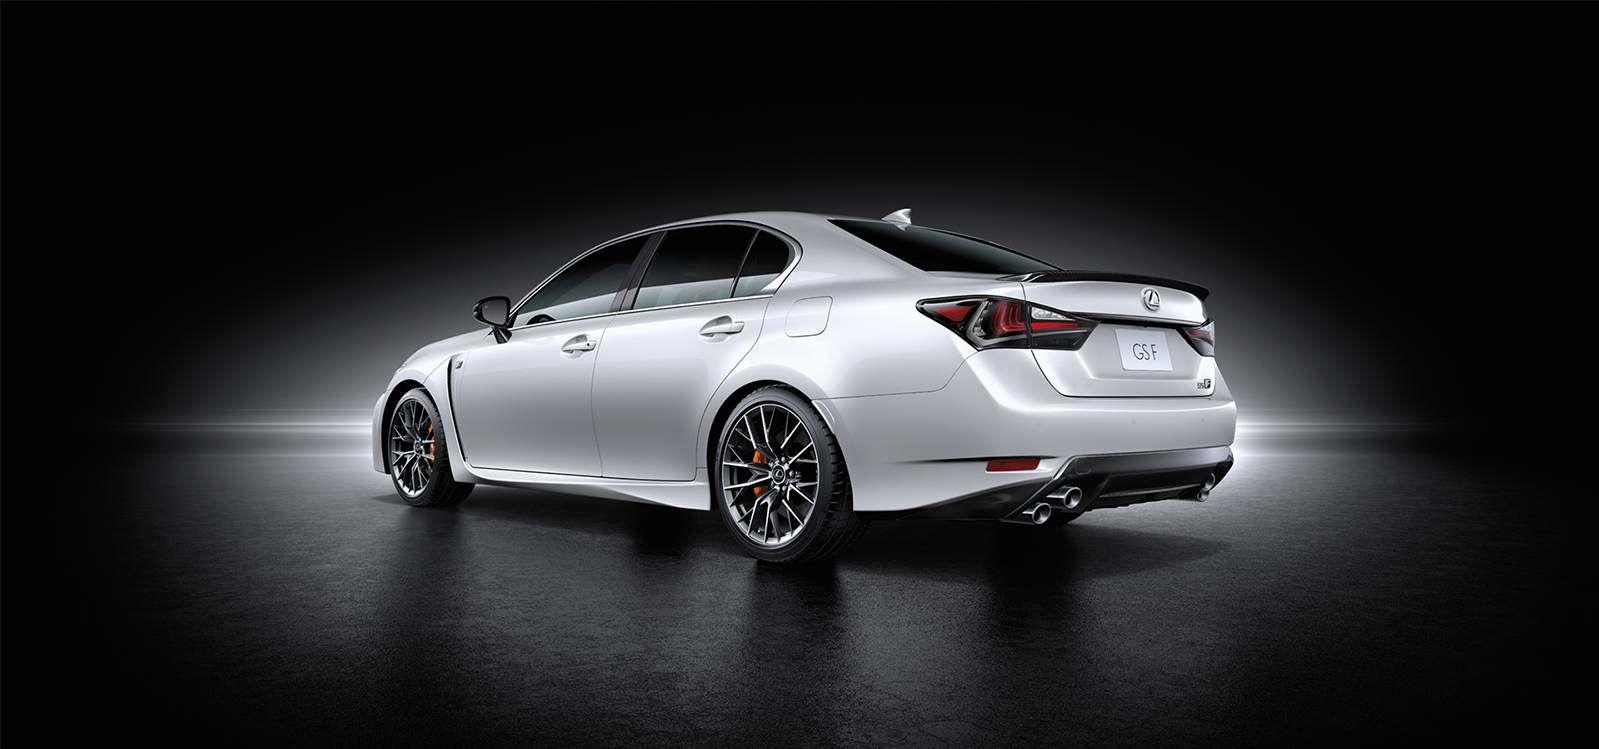 Lexus 2020 Gsf Ultra White L